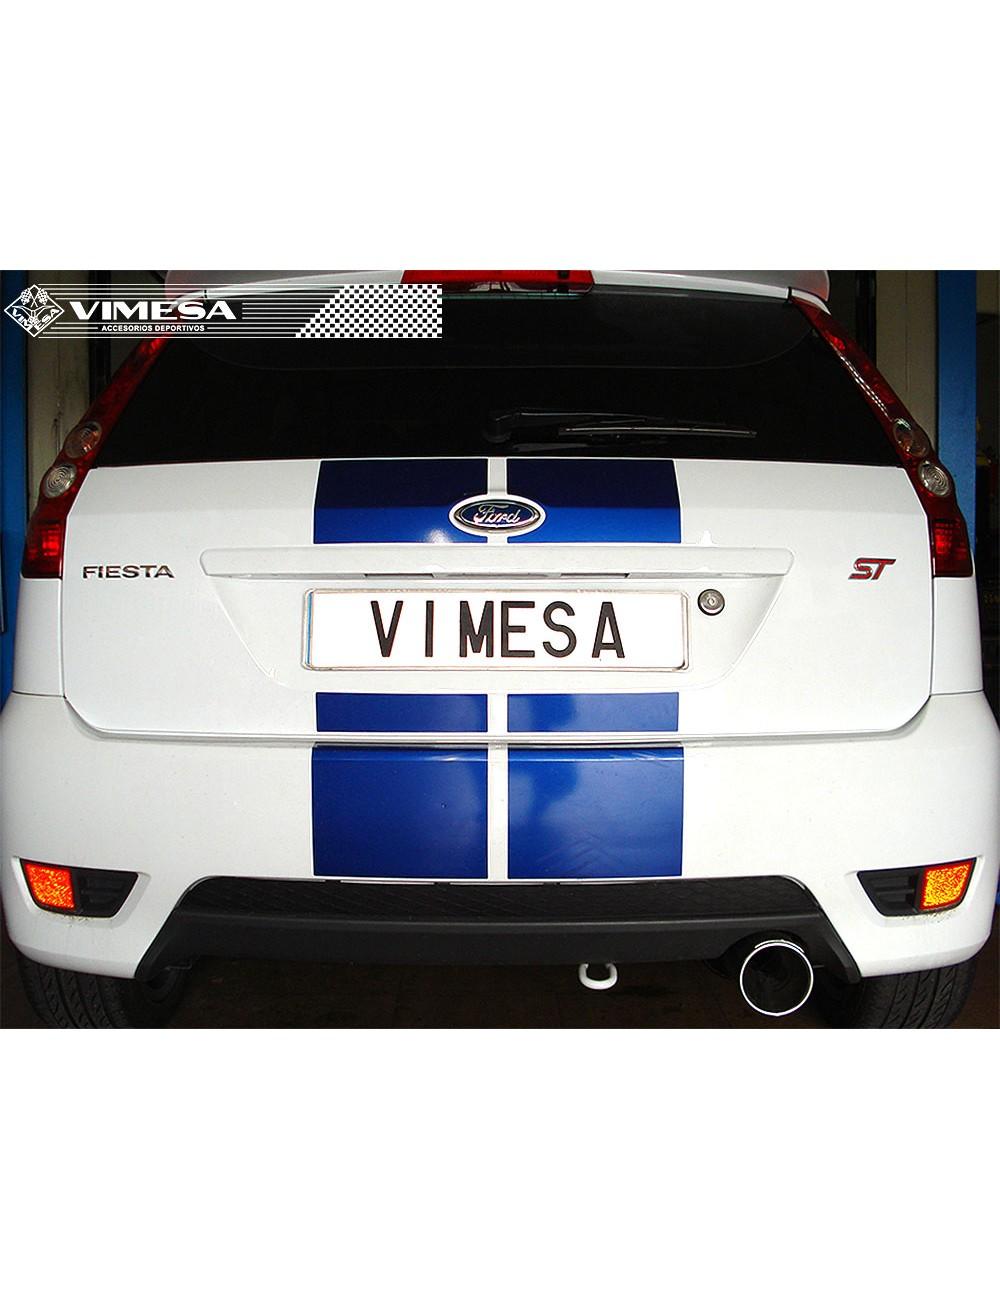 Escape deportivo VIMESA, para FORD FIESTA ST MK5